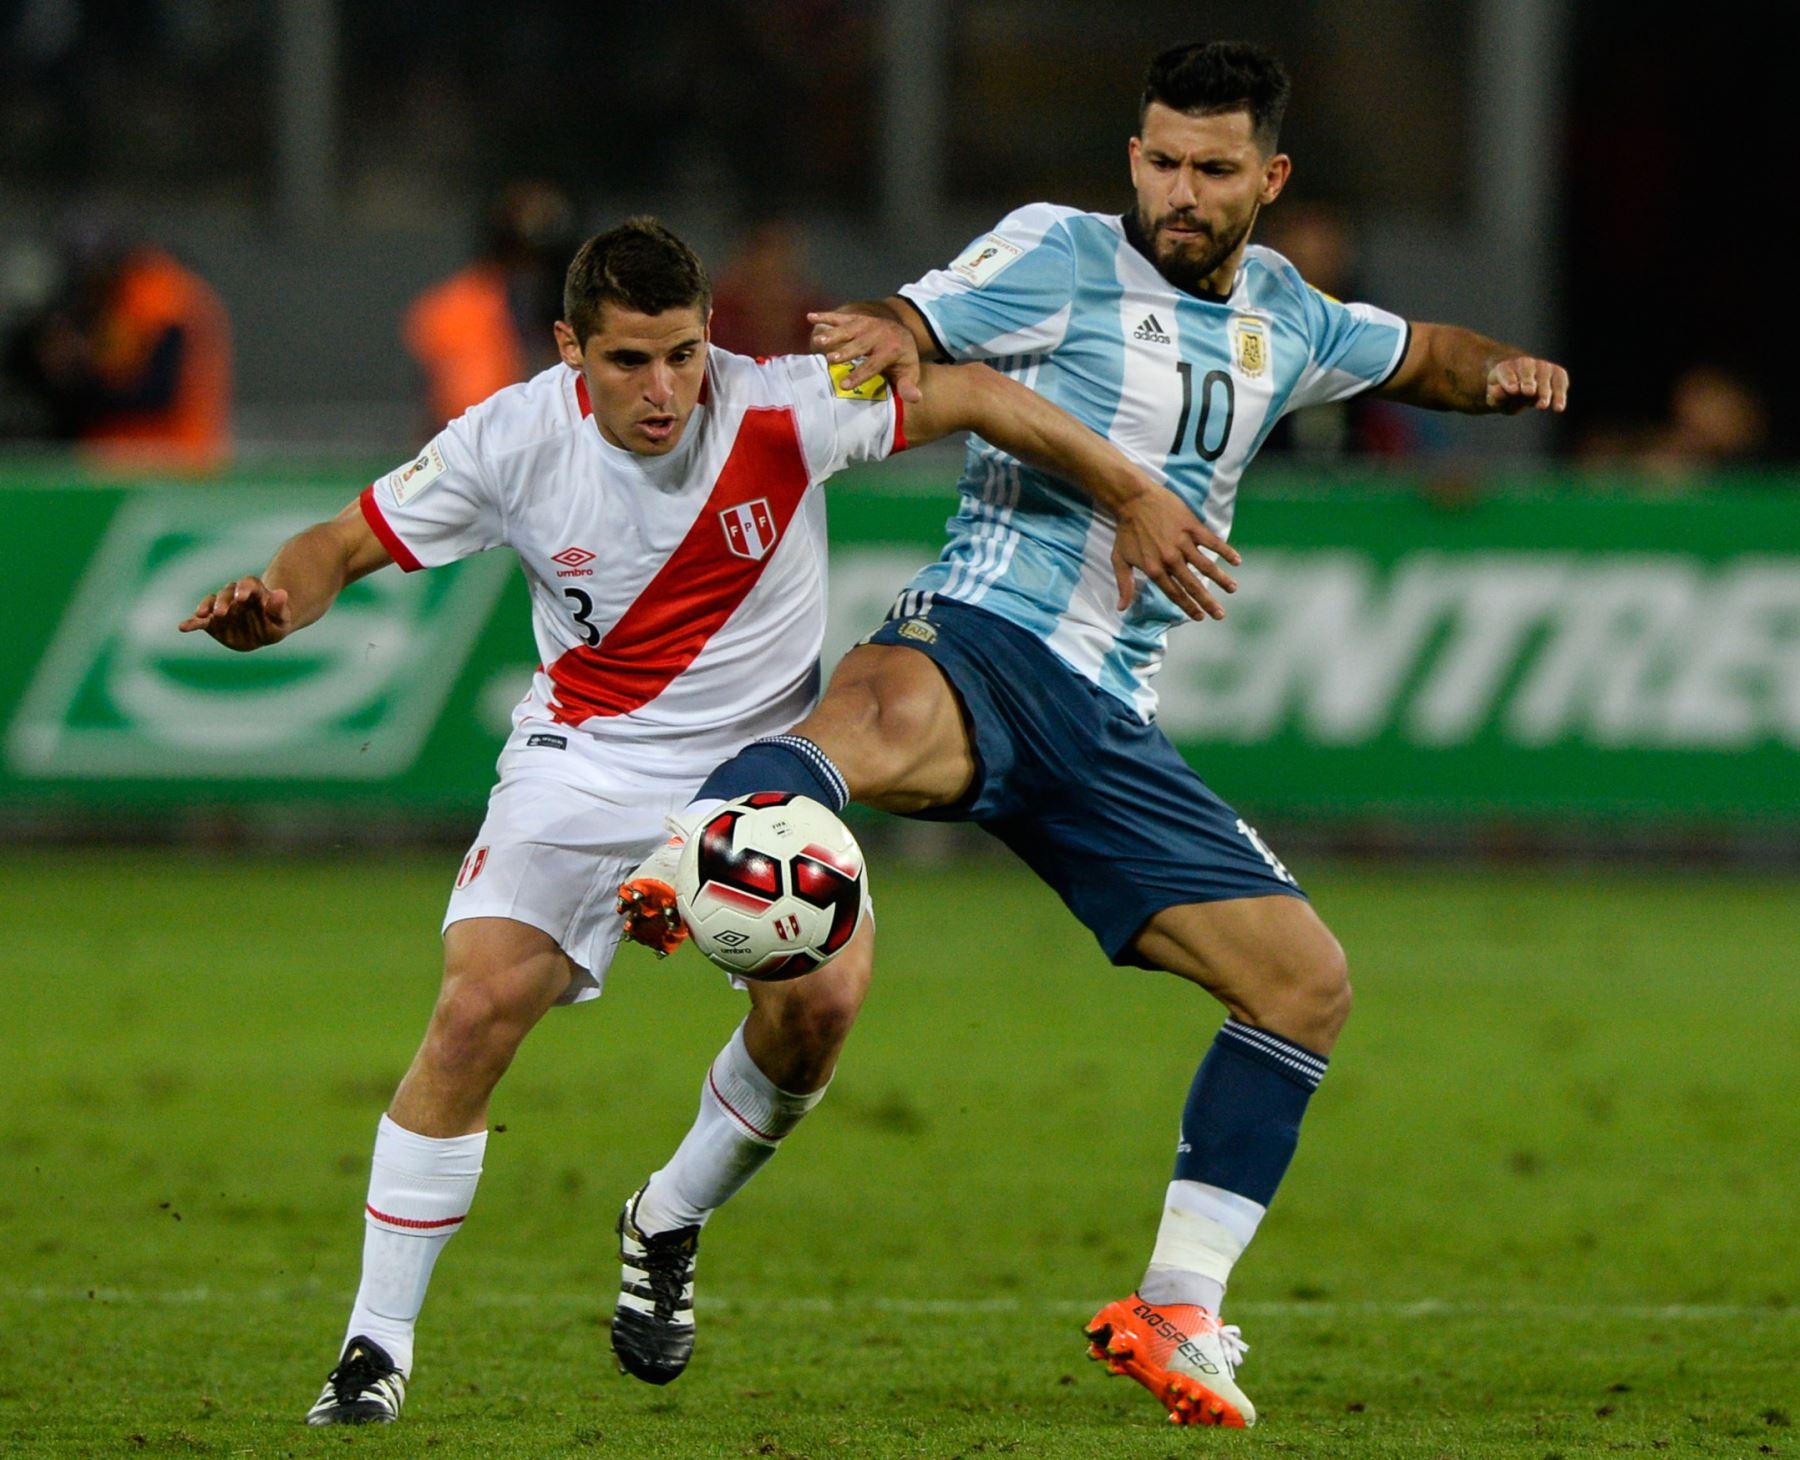 Aldo Corzo marcando a Sergio Agüero. AFP